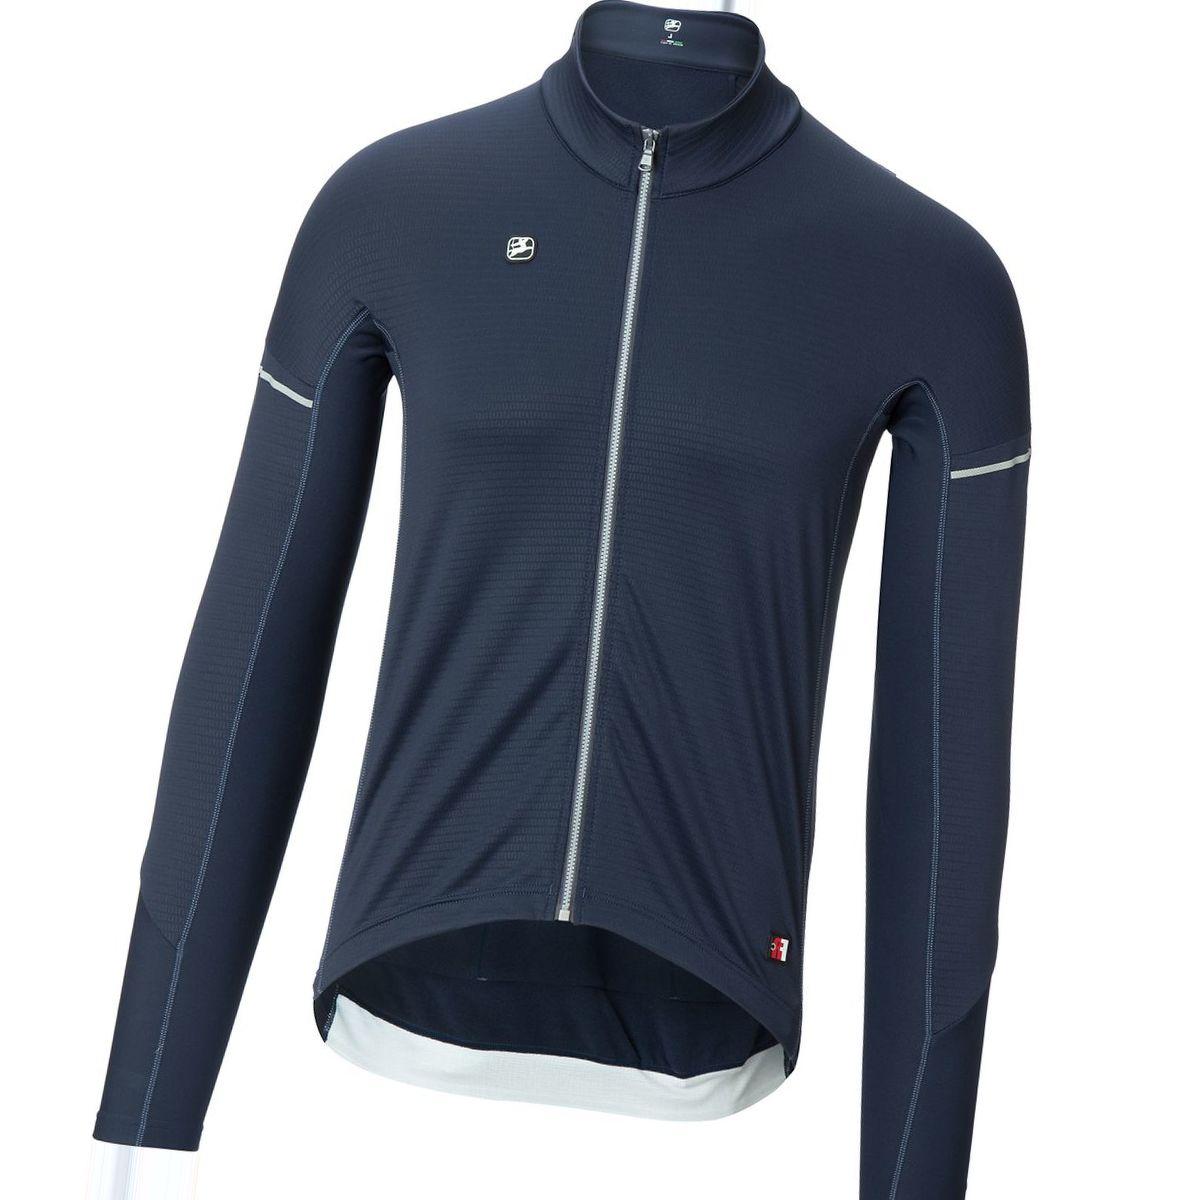 Giordana FR-C Pro Long-Sleeve Jersey - Men's